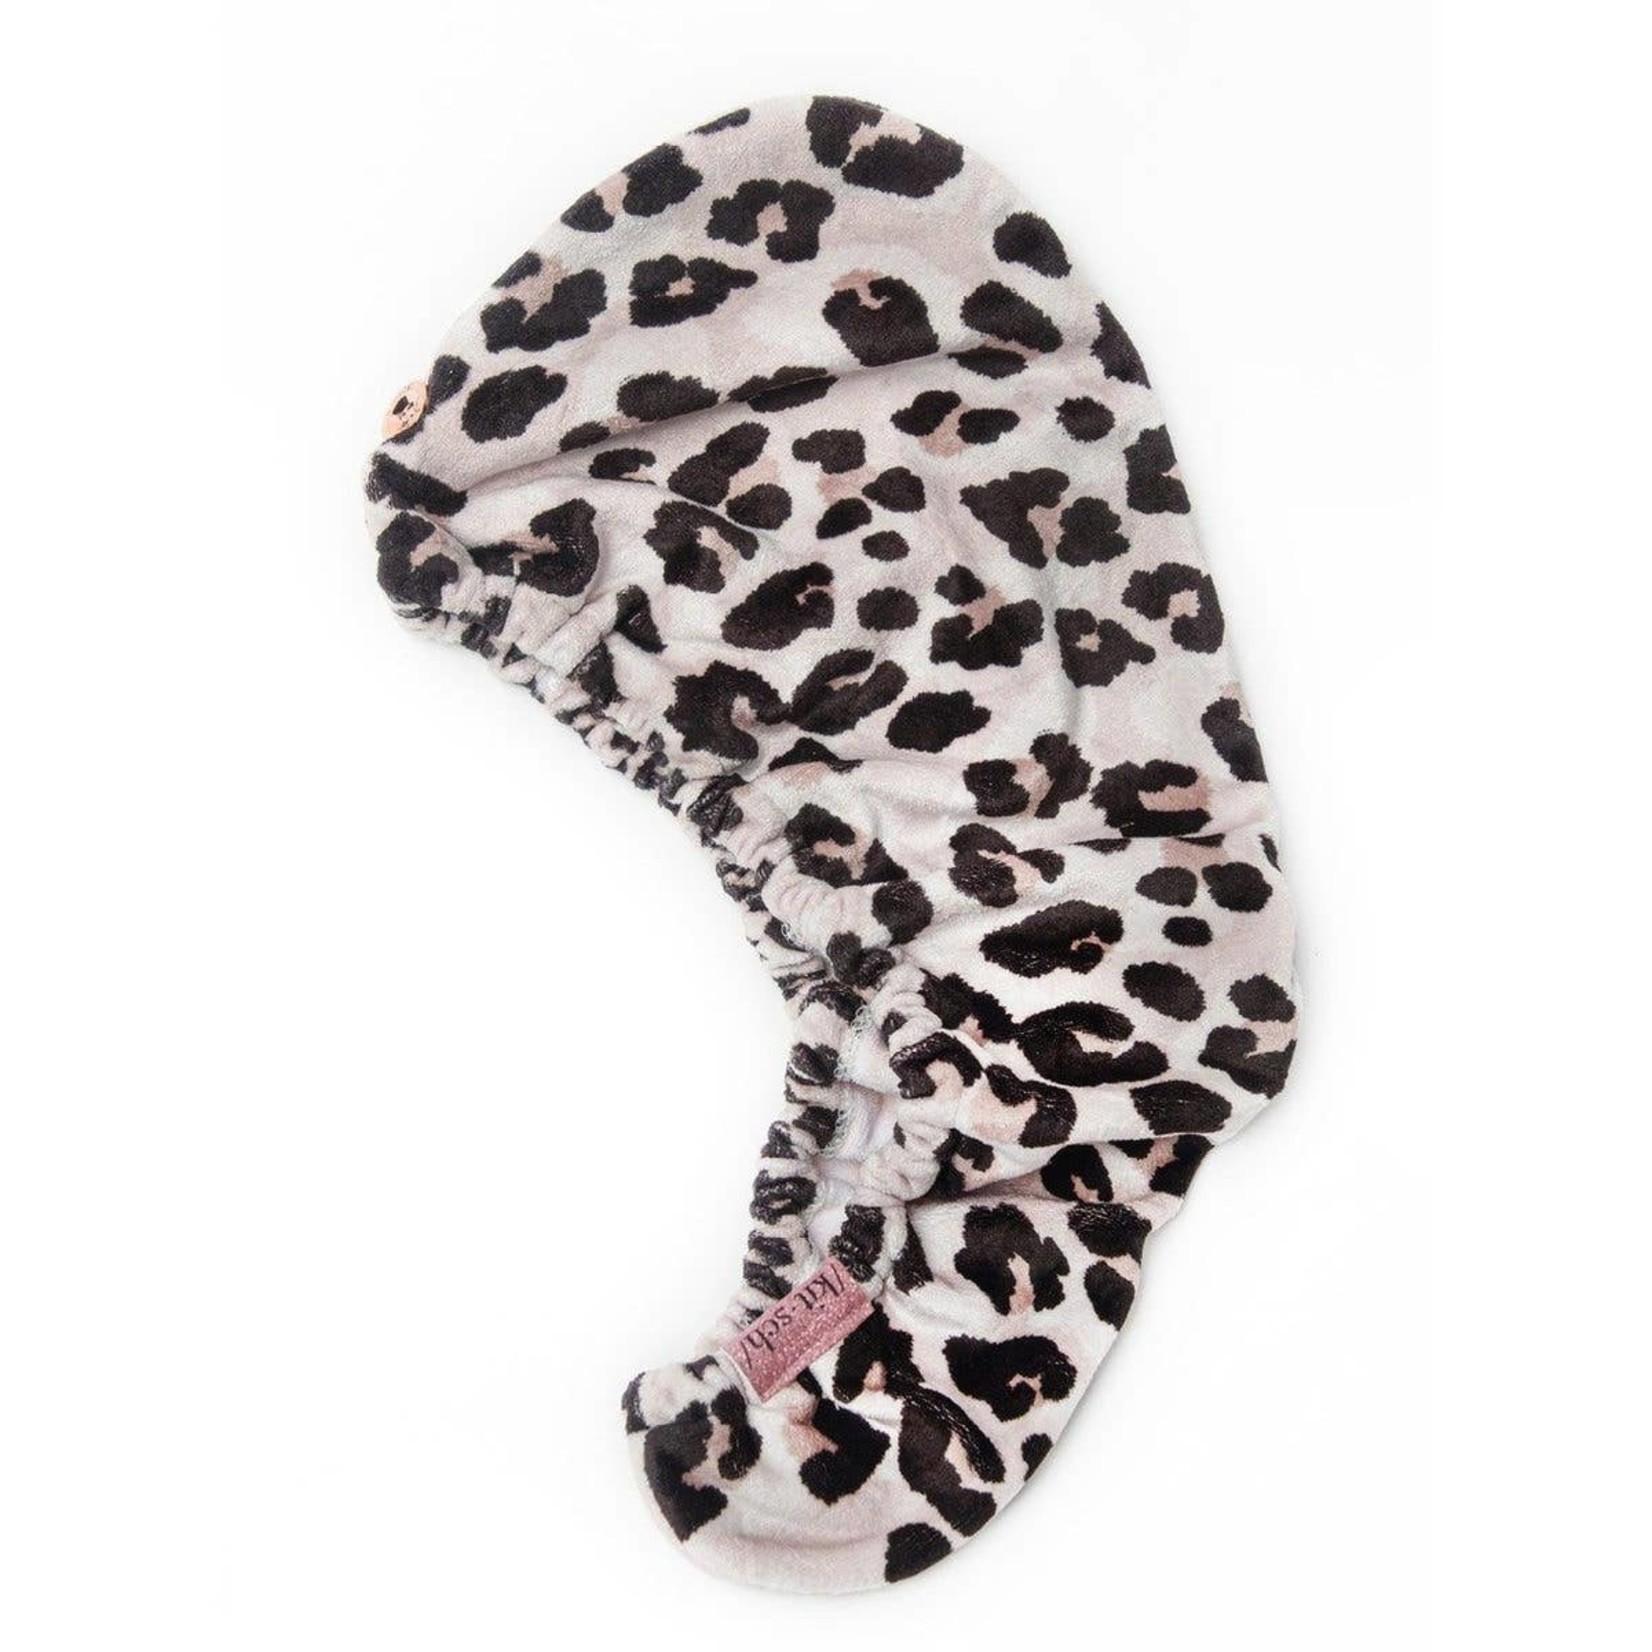 Kitsch Microfiber Hair Towel in Leopard